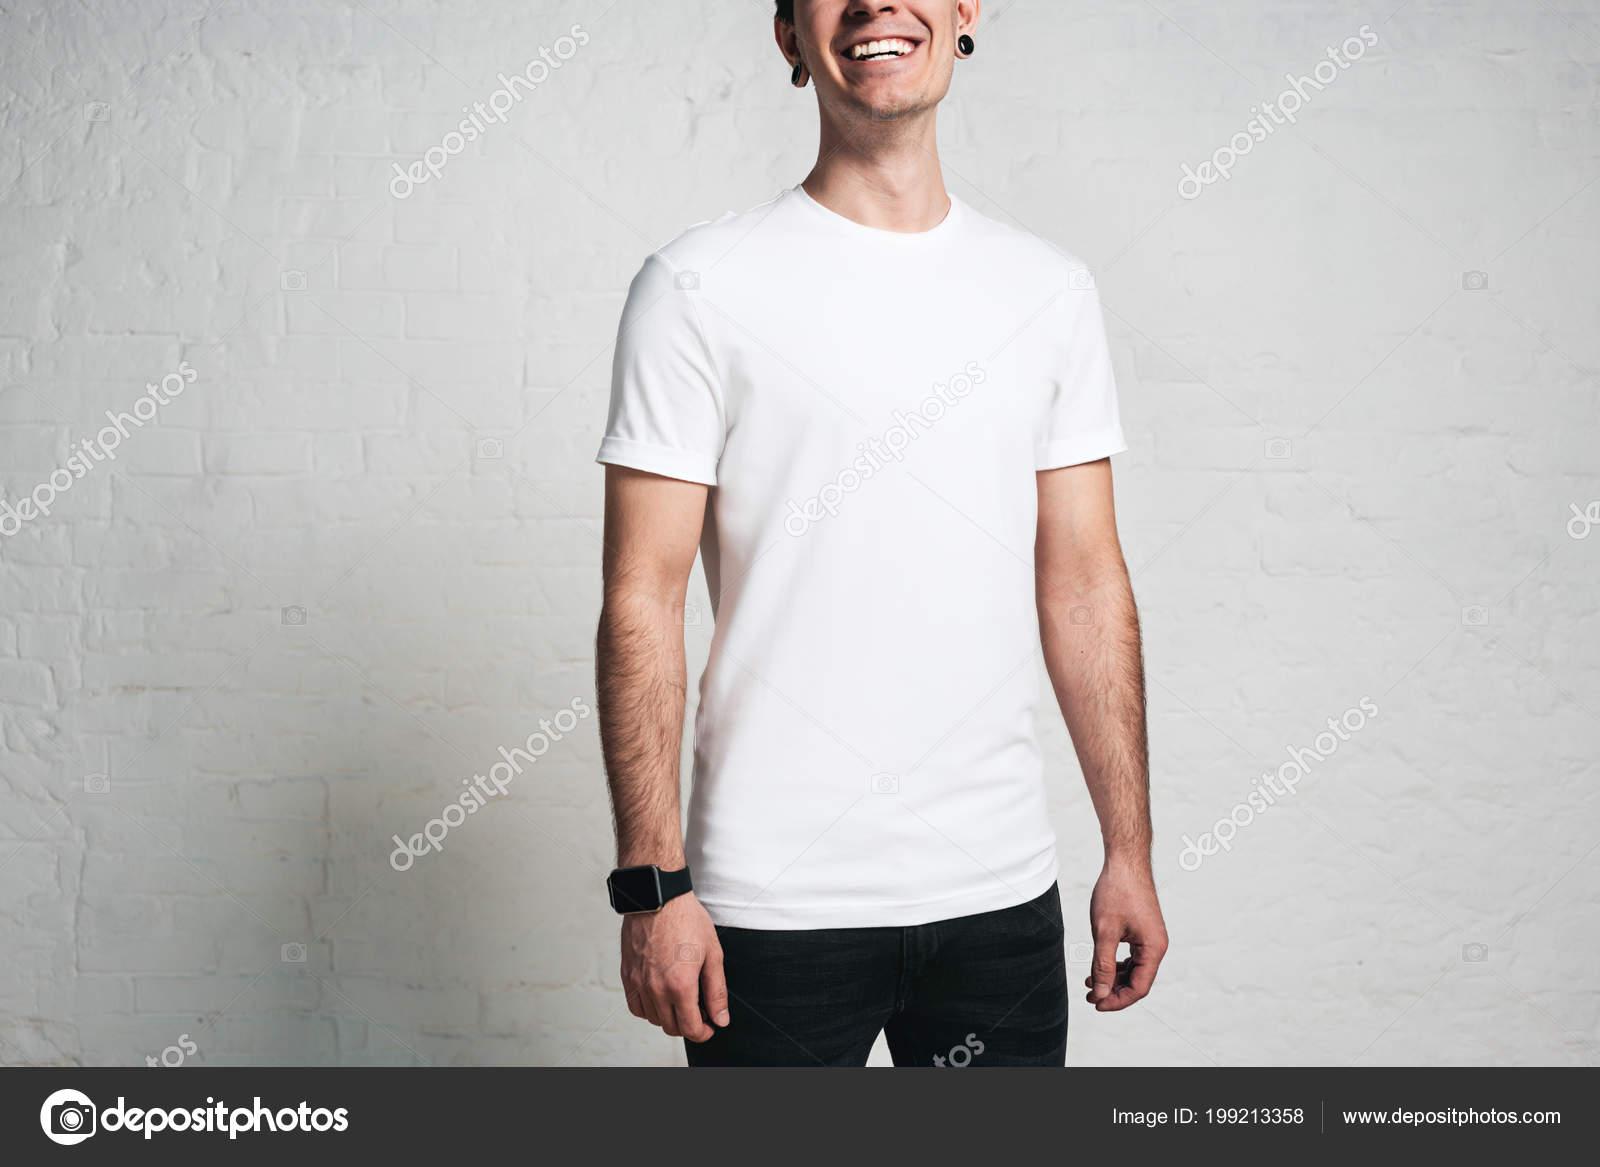 22ad29de7234e Joven Sonriente Camiseta Blanca Blanco Retrato Estudio Horizontal Pared  Vacía — Fotos de Stock